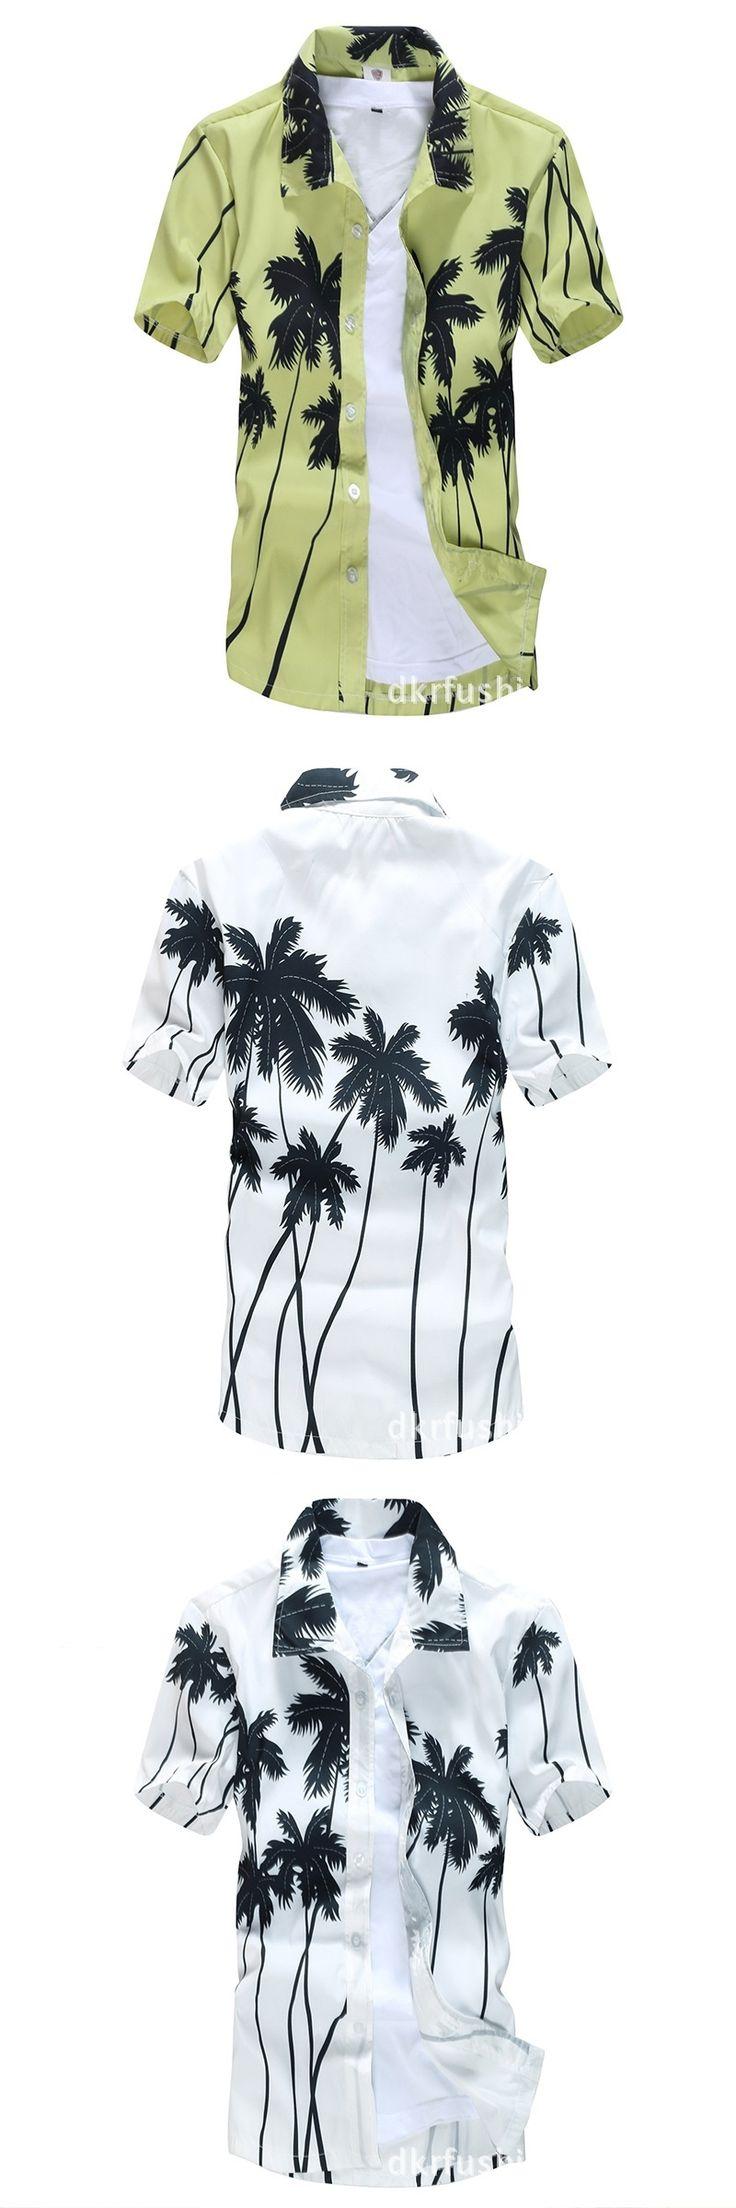 Mens Hawaiian Shirt 2017 Summer Printed Quick Dry Beach Shirts Short Sleeve Floral Casual Shirts For Men Plus Size S-5XL XA067